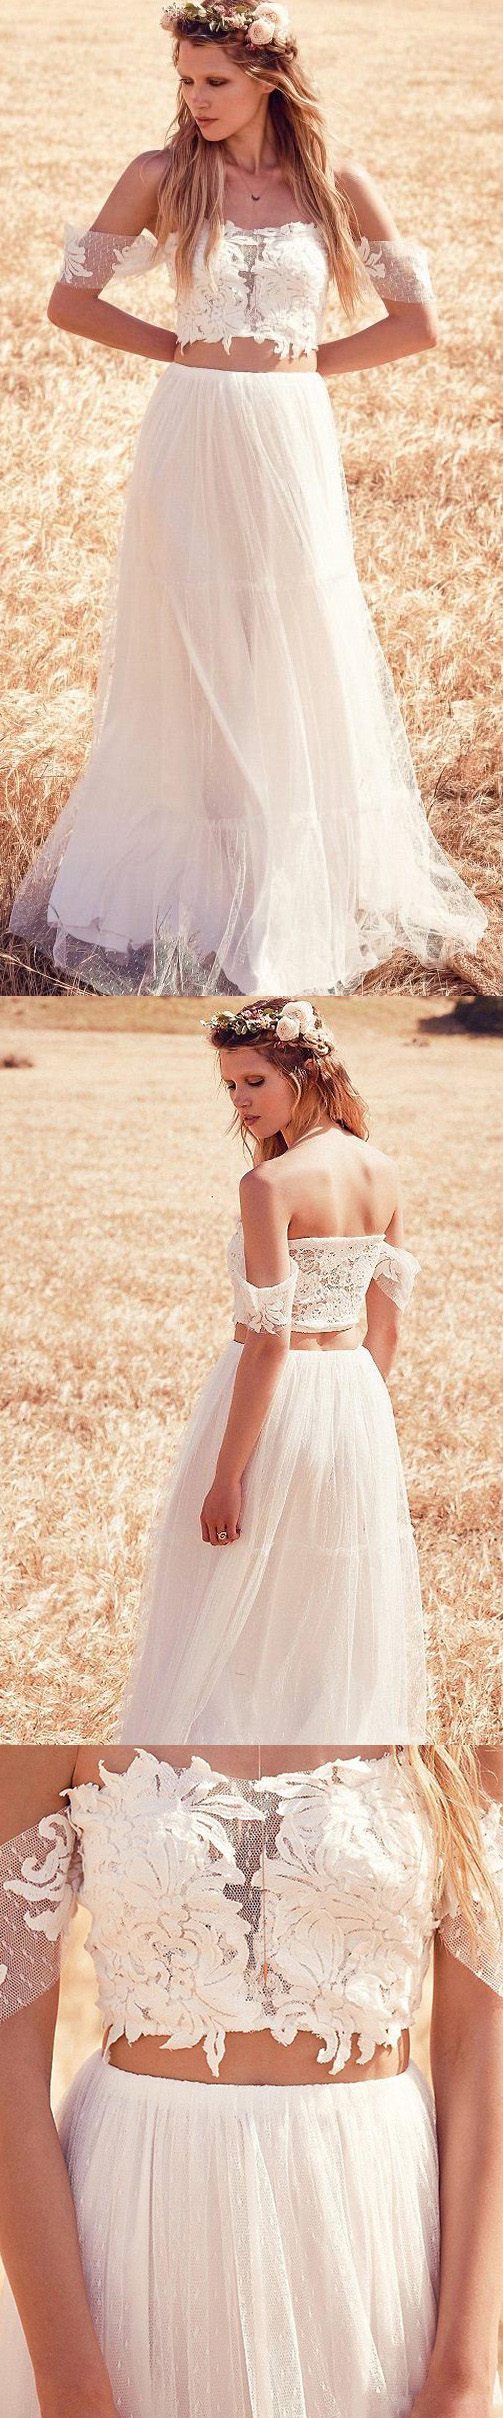 Cute short wedding dresses  Lace Ivory Wedding Dresses Cute Long OfftheShoulder Short Sleeve